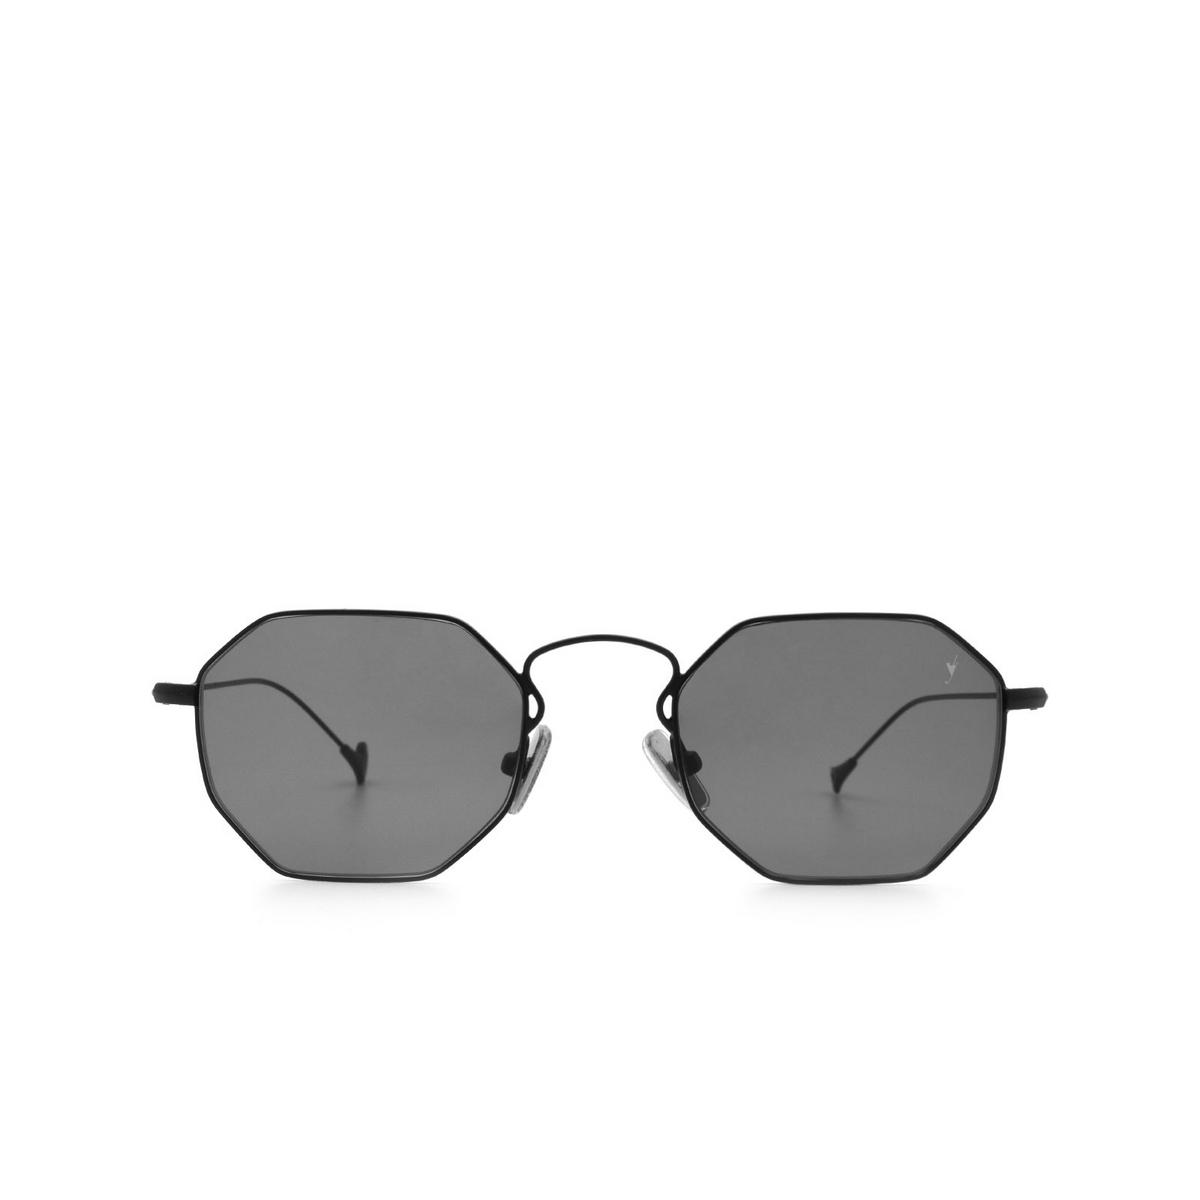 Eyepetizer® Irregular Sunglasses: Claire X Mia Burton color Black C.6-7 - 1/6.